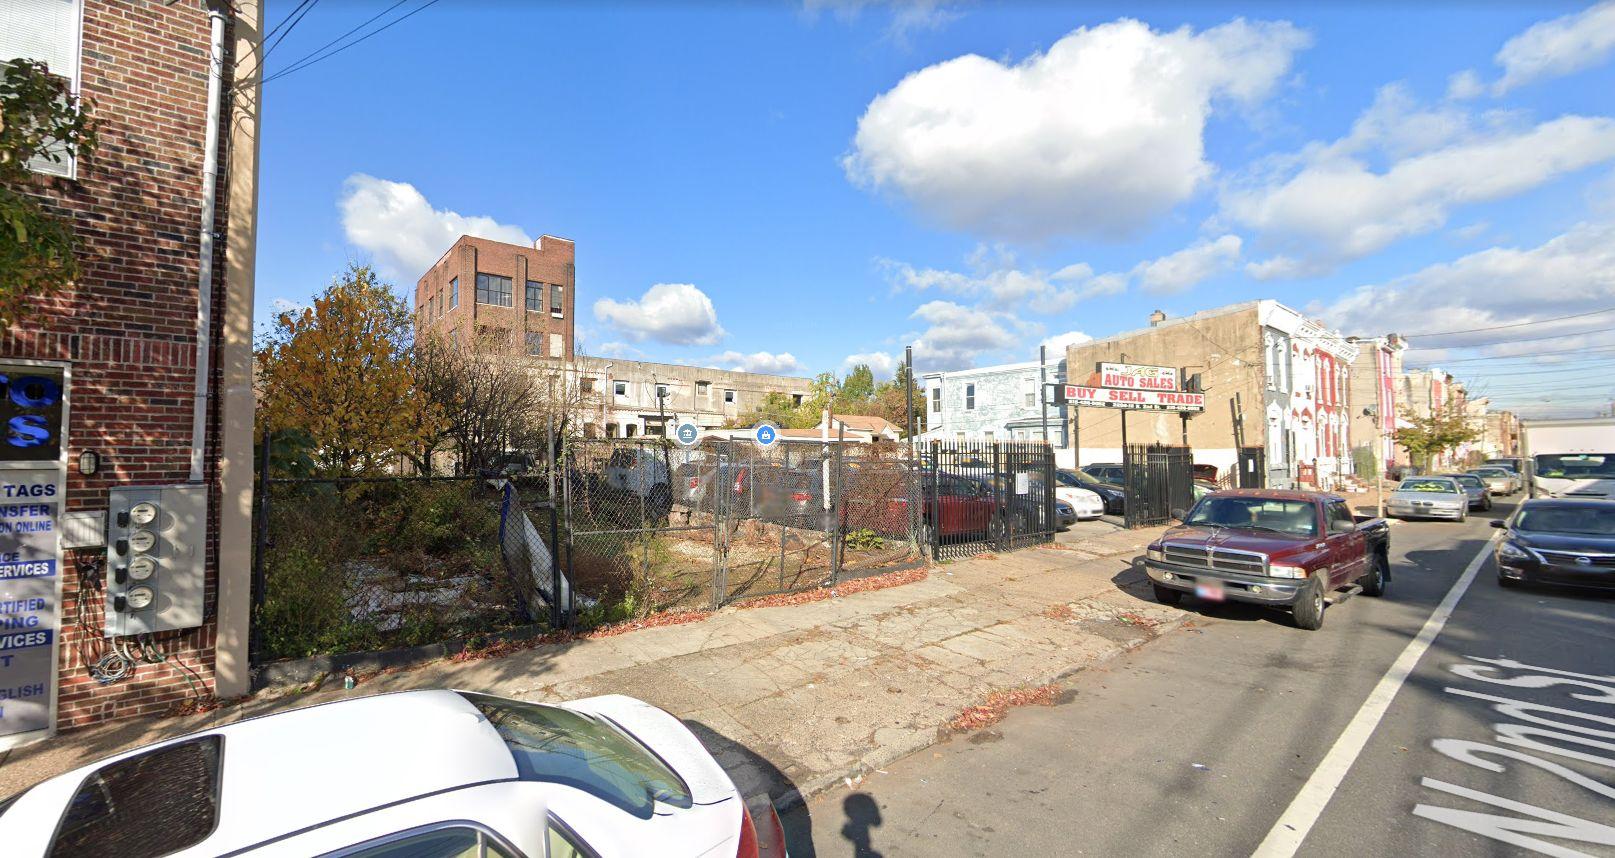 2206 North 2nd Street. Looking northwest. Credit: Google Maps